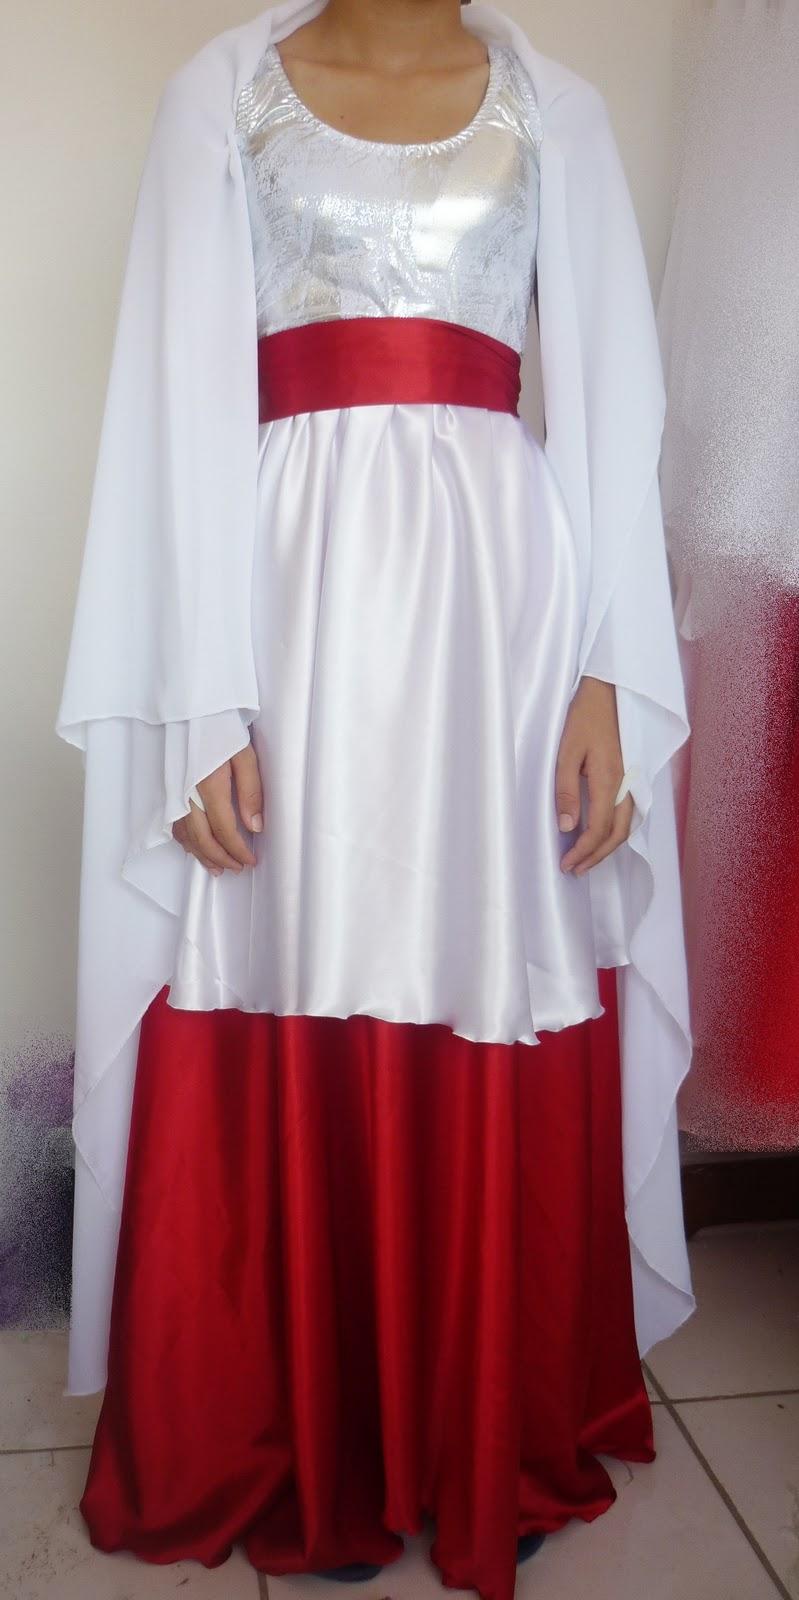 Vestidos Moda Evangelica - Encontre aqui modelos de